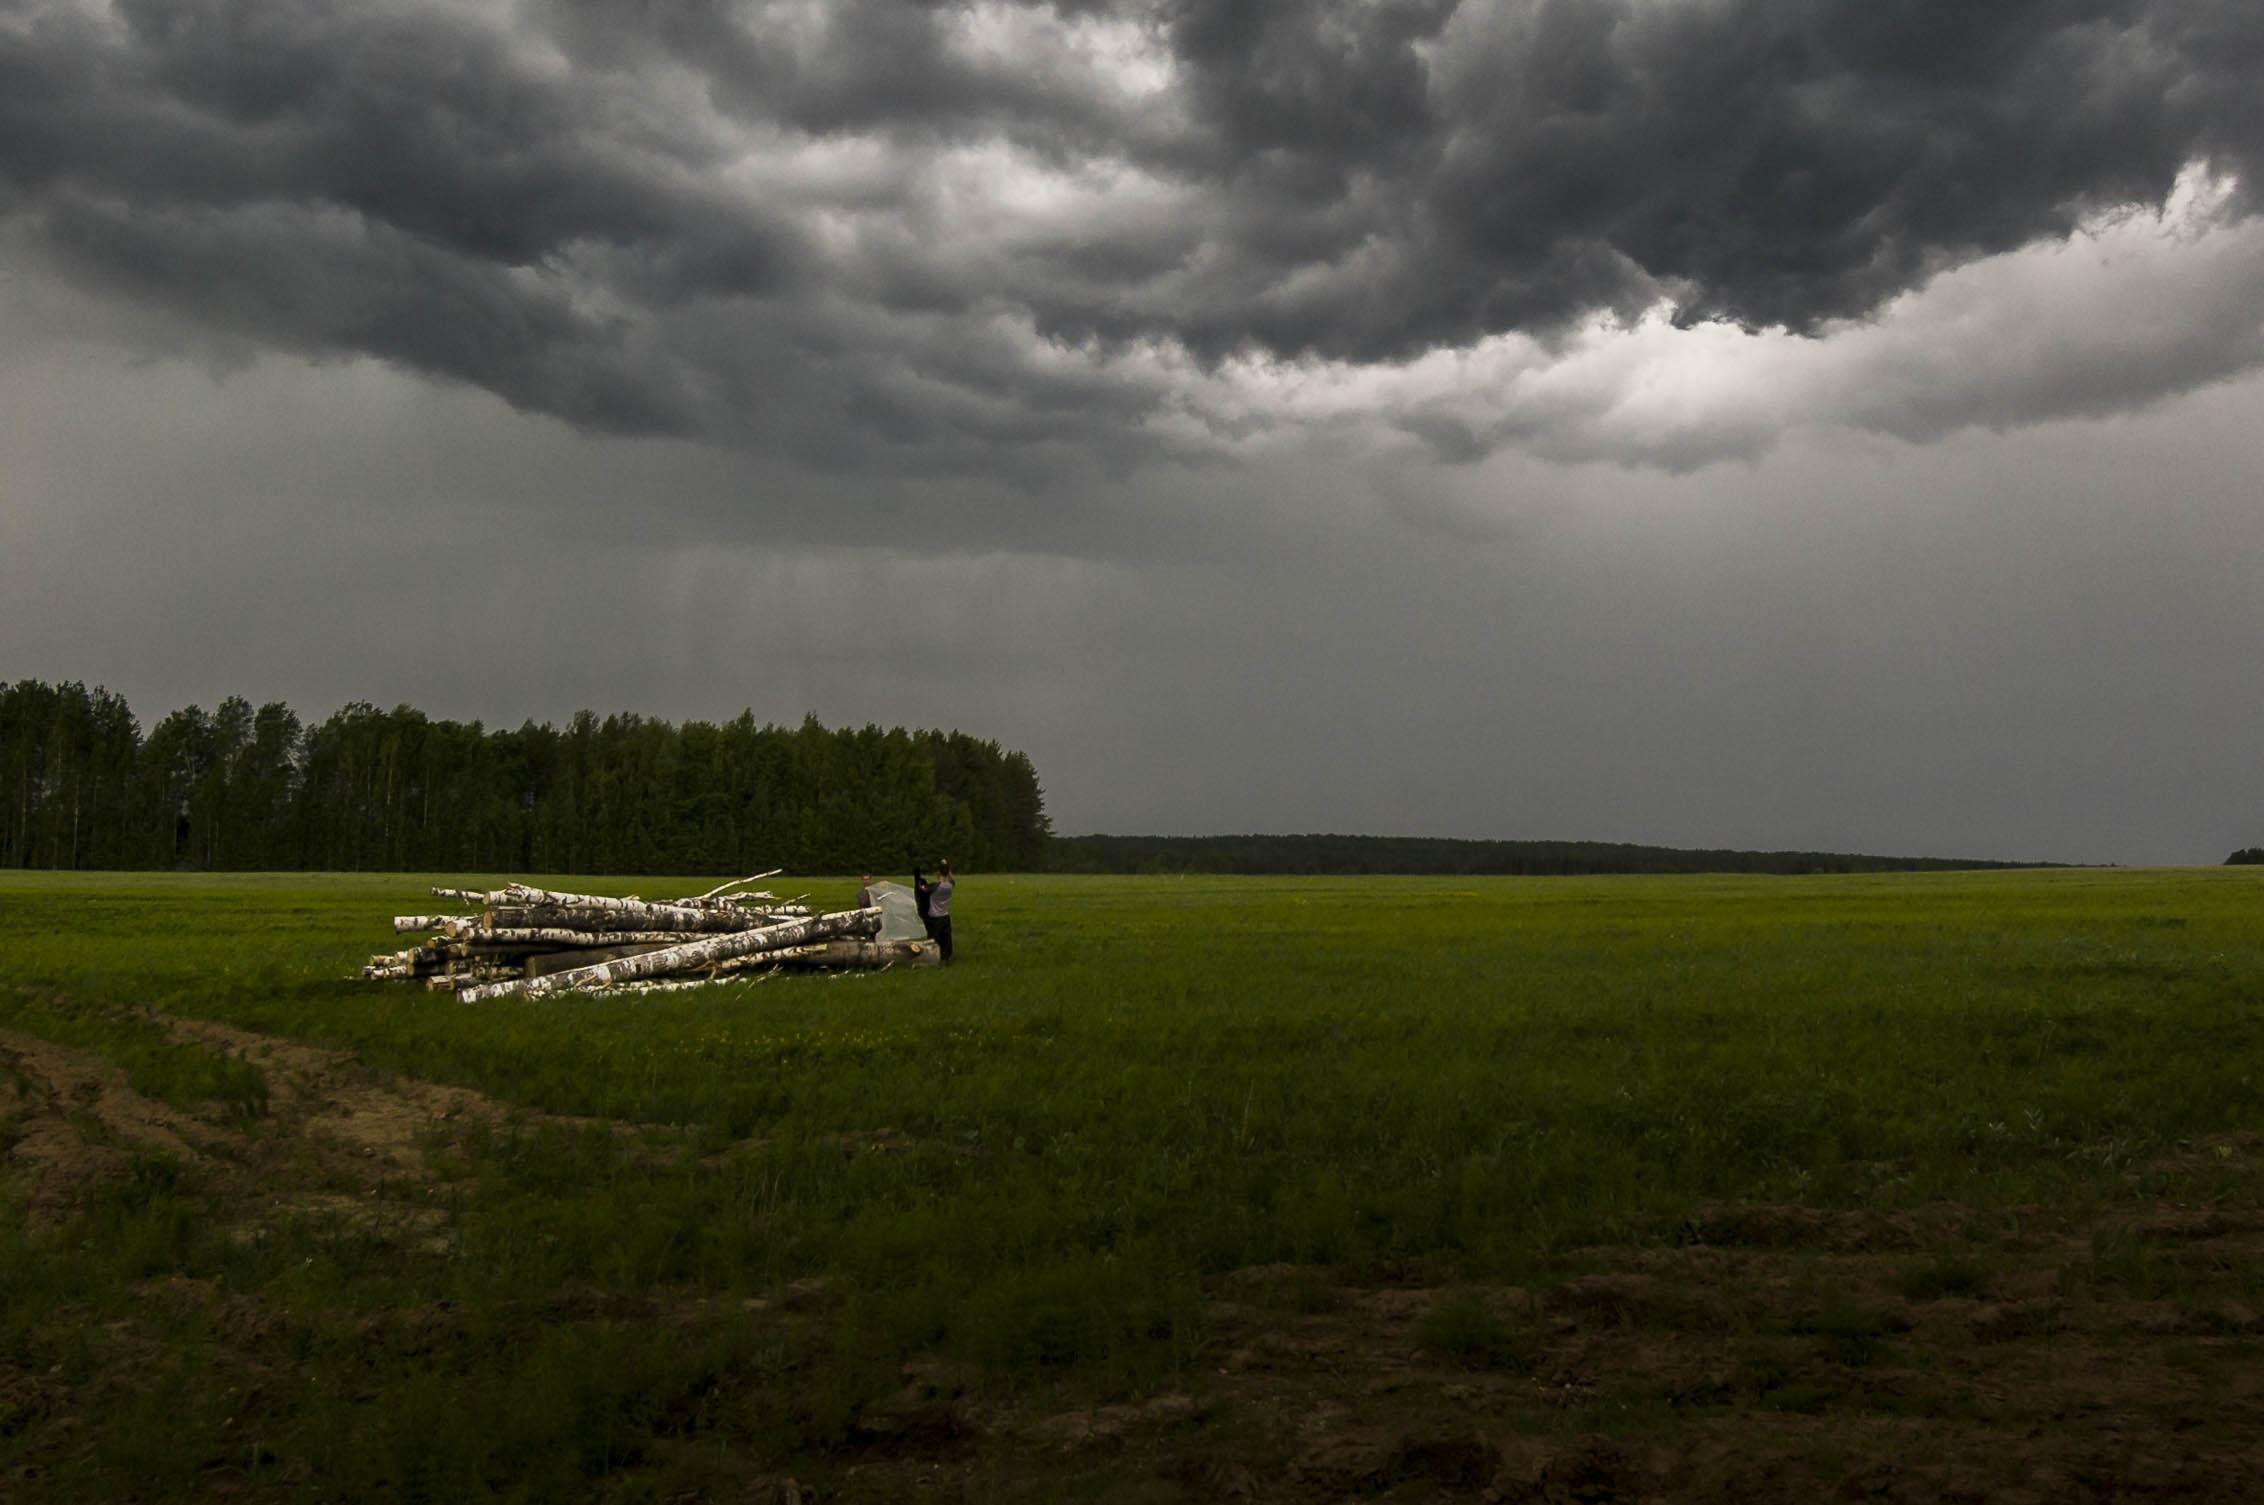 Pilgrims pause to take precautions against the rain, Kirov region, June 2010